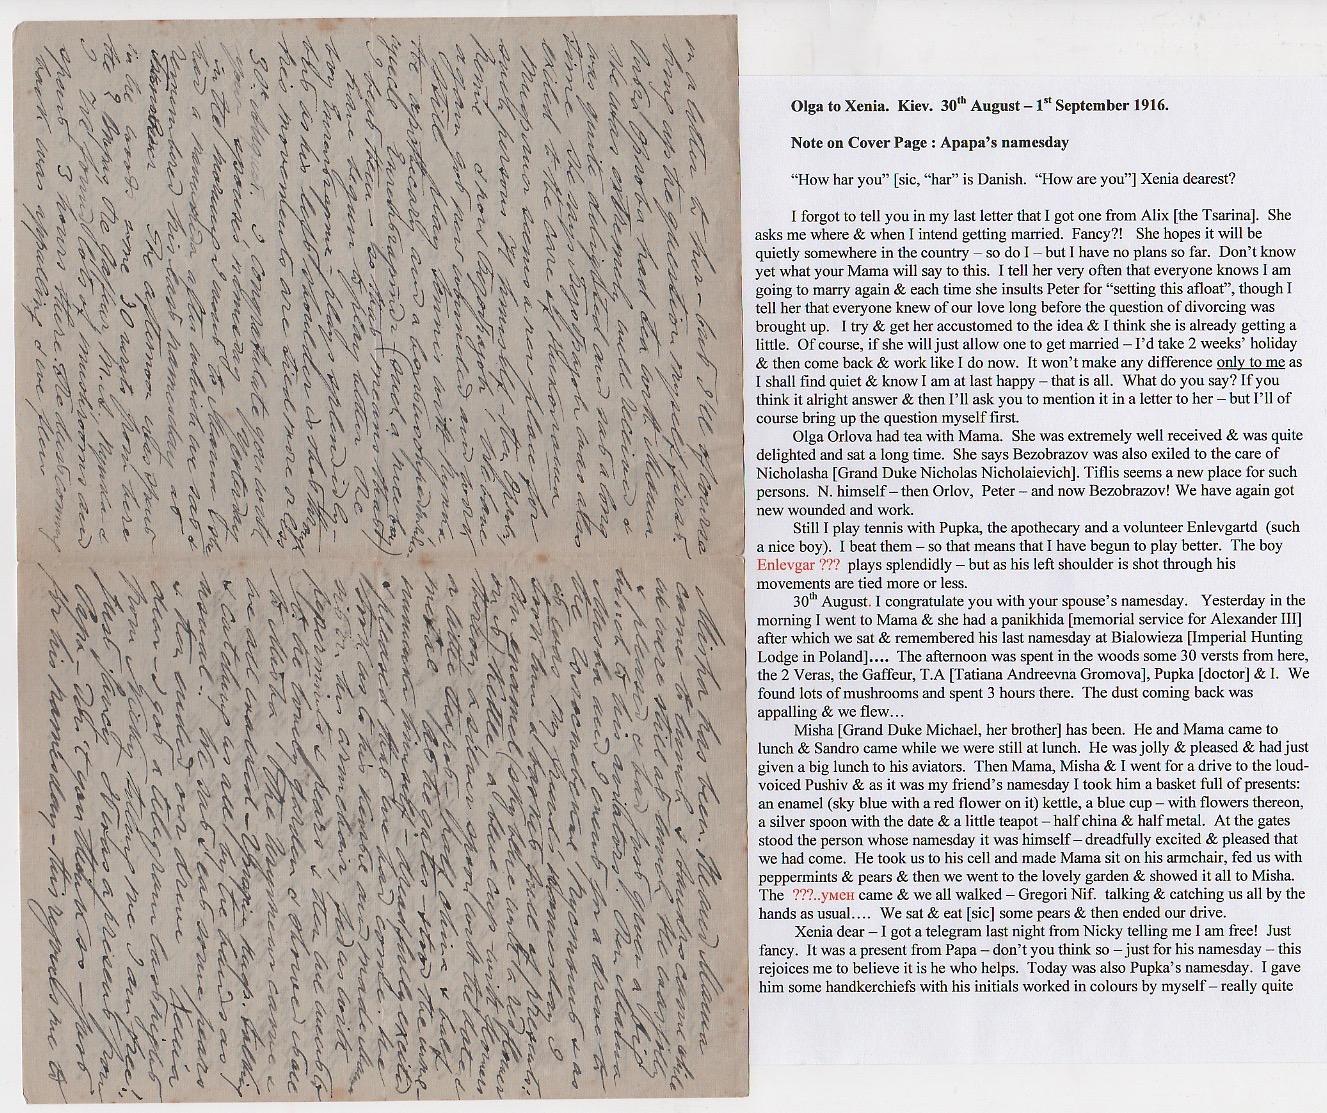 Royalty Grand Duchess Olga Correspondence To Her Sister Grand Duchess Xenia 1916-1920 - Image 22 of 47